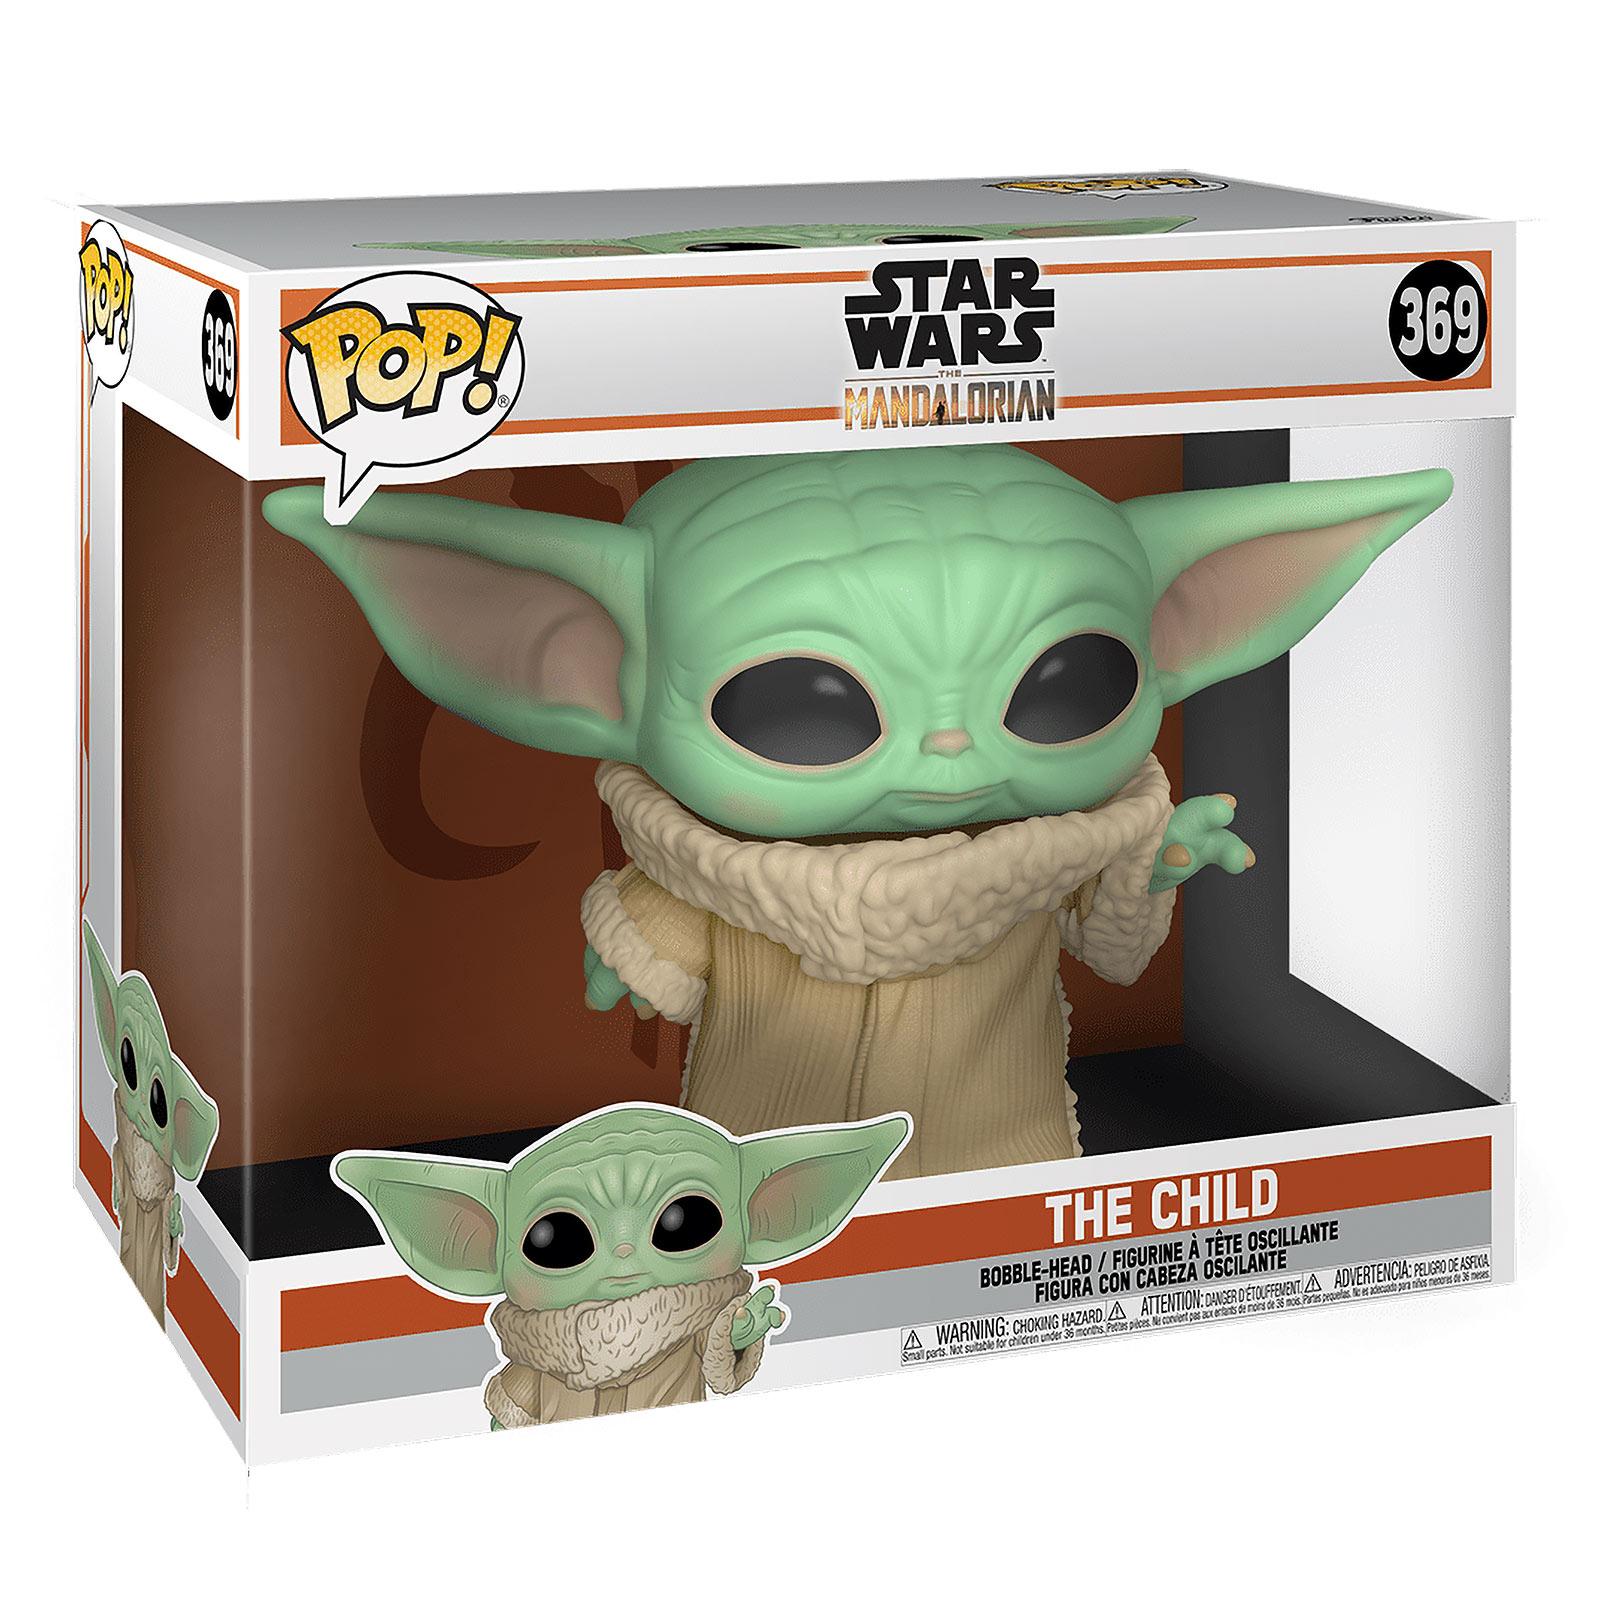 The Child 25 cm Funko Pop Wackelkopf-Figur - Star Wars The Mandalorian